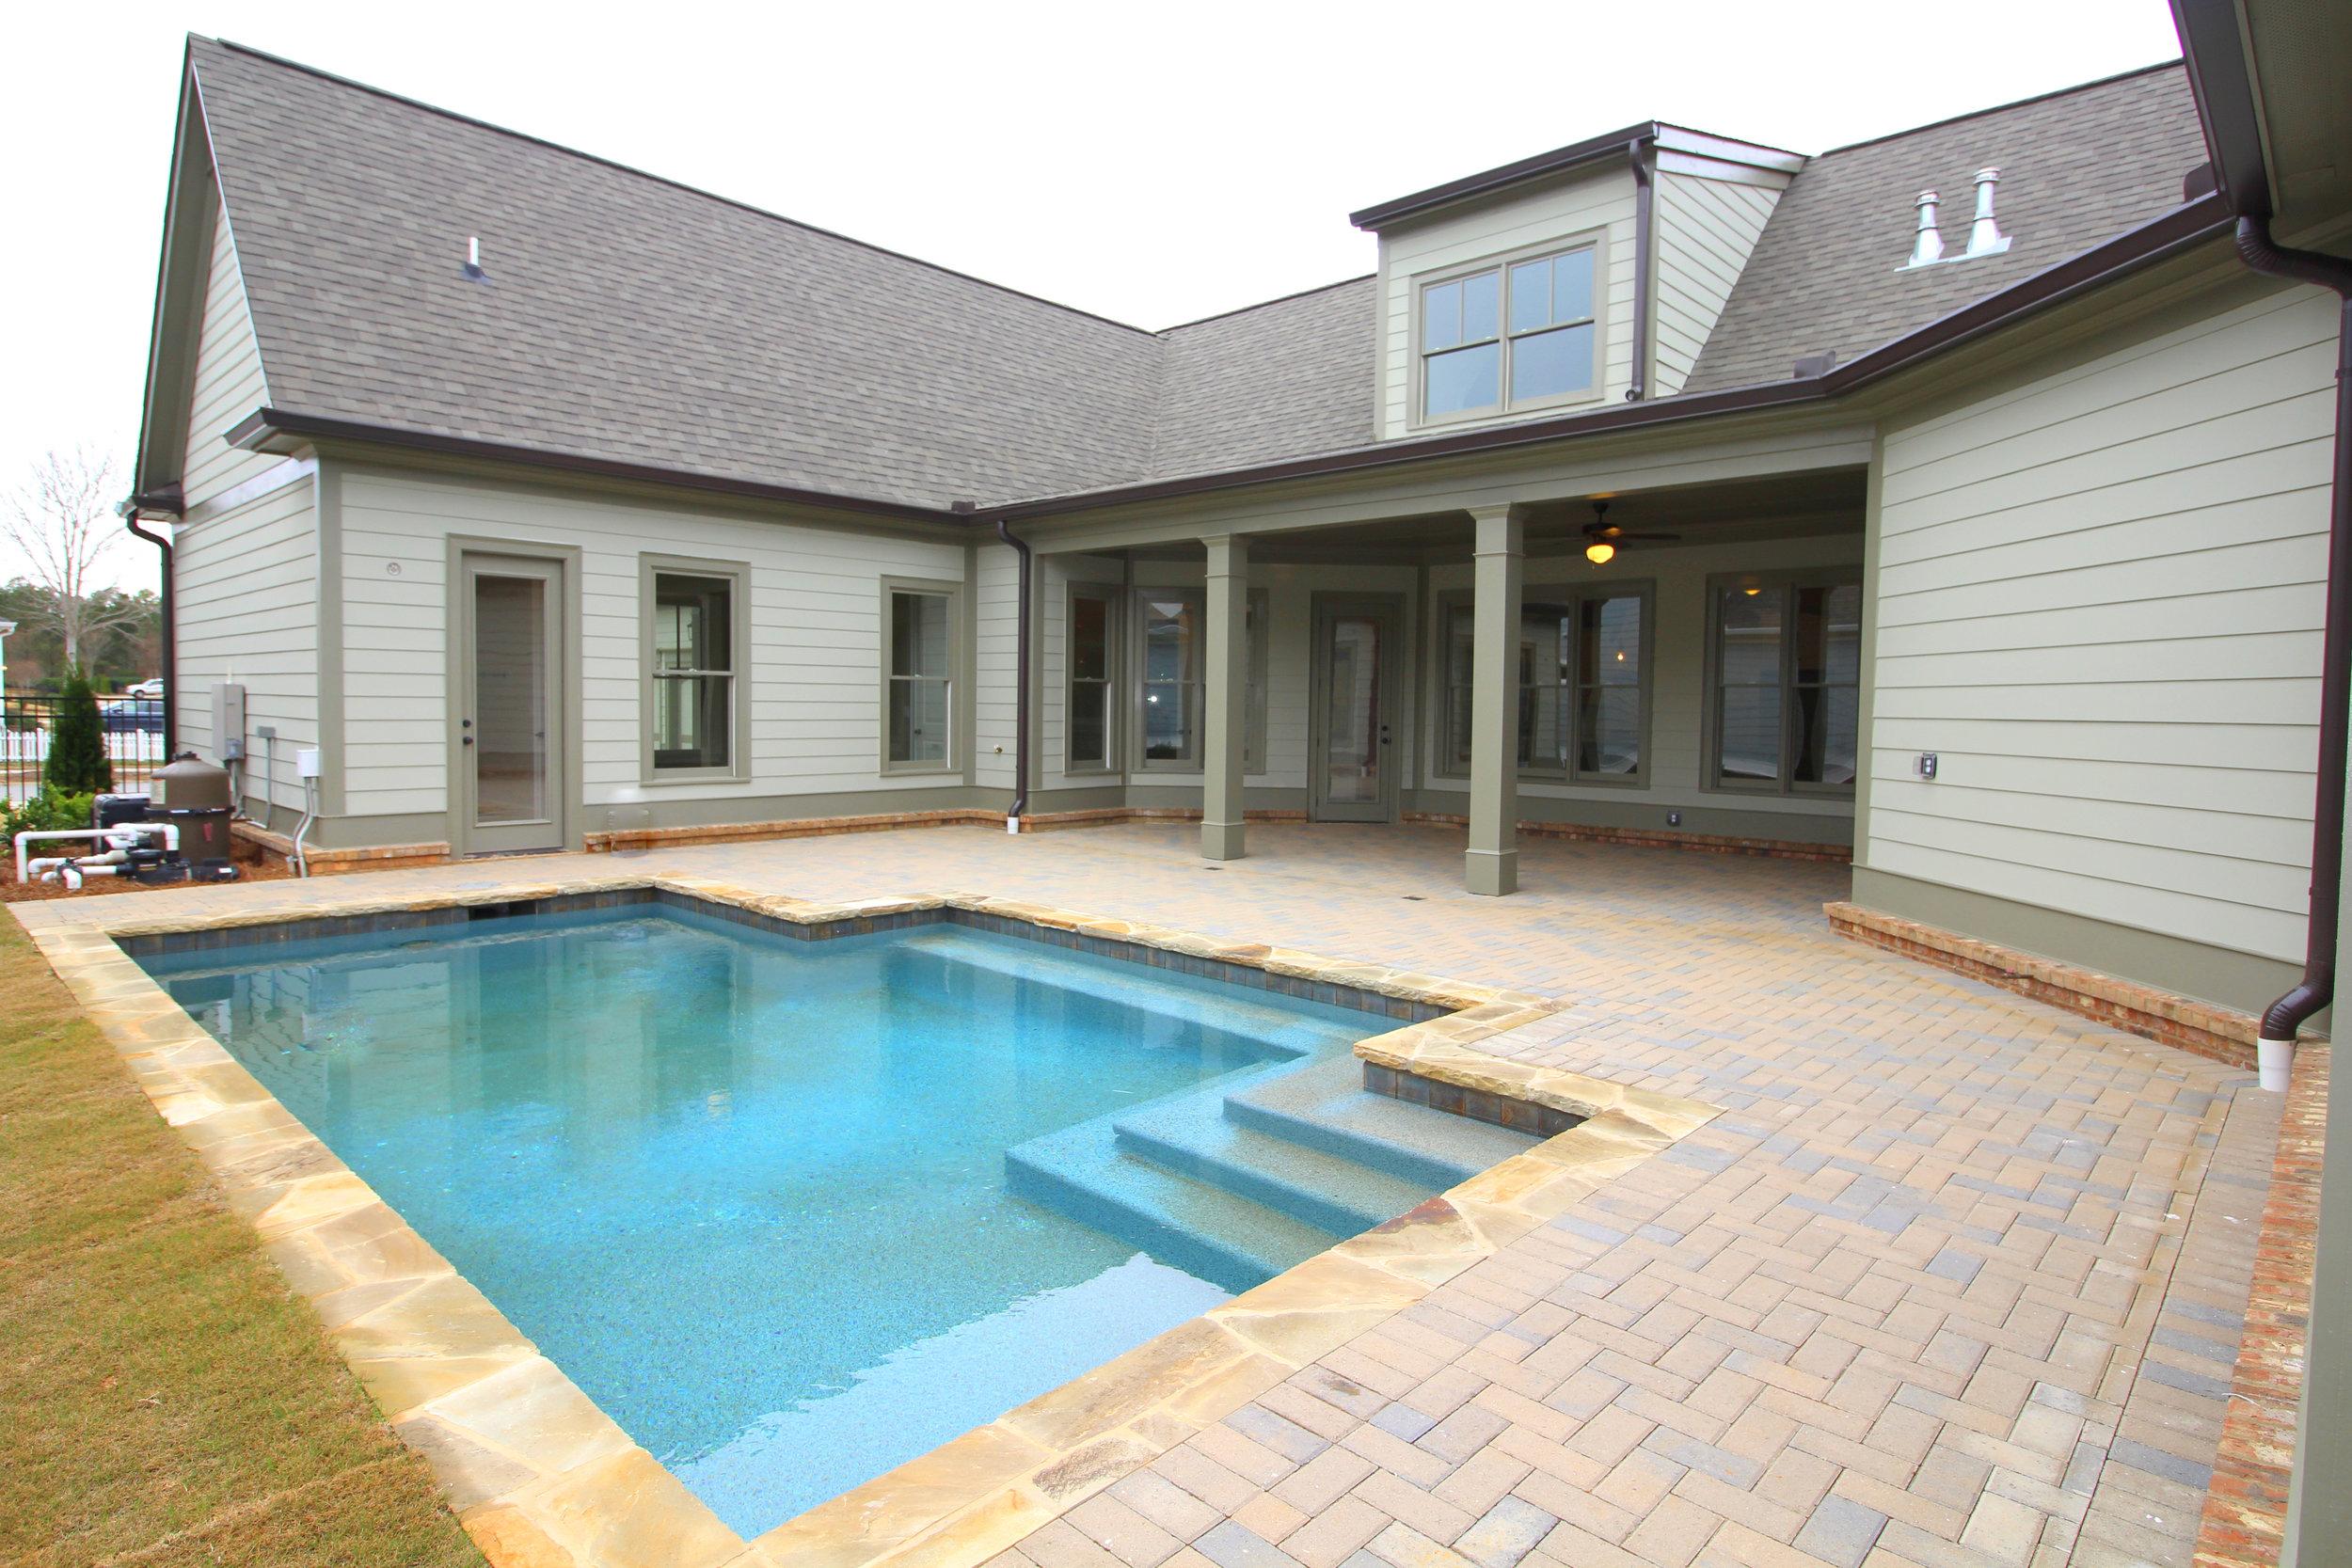 custom-built-in-pool-1756-greenleffe-drive-statham-ga-30666-the-georgia-club-oconee-county-oconee-springs-athens-area-home-for-sale-courtyard-homes.JPG